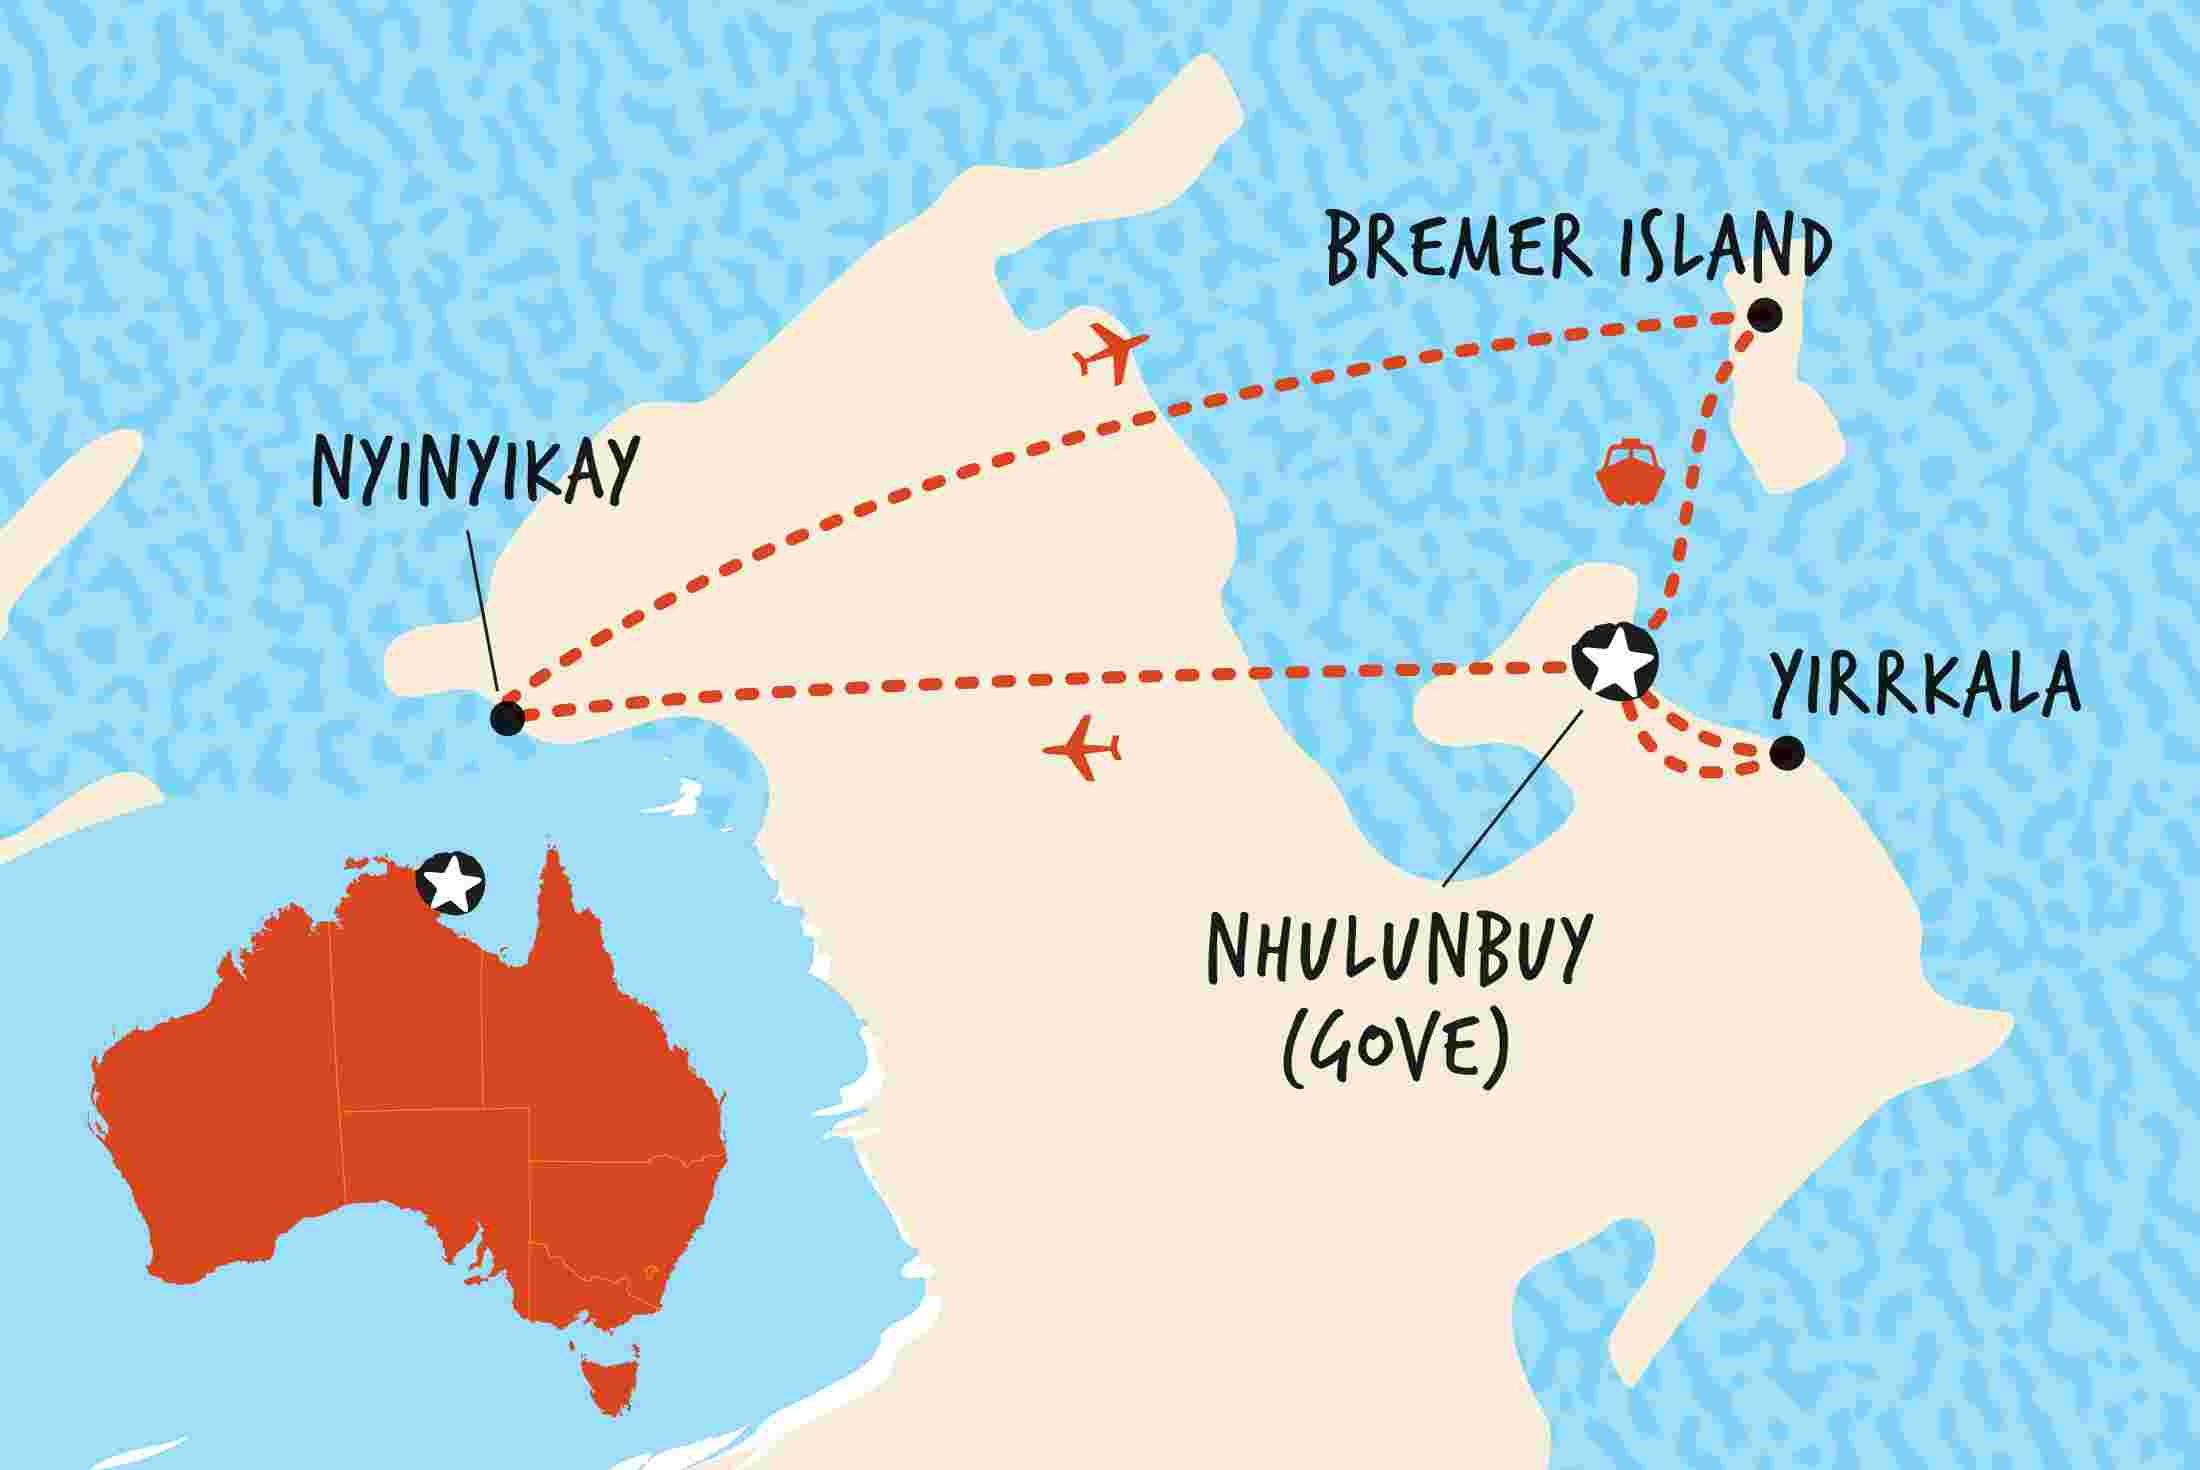 Australia Land Map.Australia Expedition Journey Into East Arnhem Land Overview Australia Expedition Journey Into East Arnhem Land